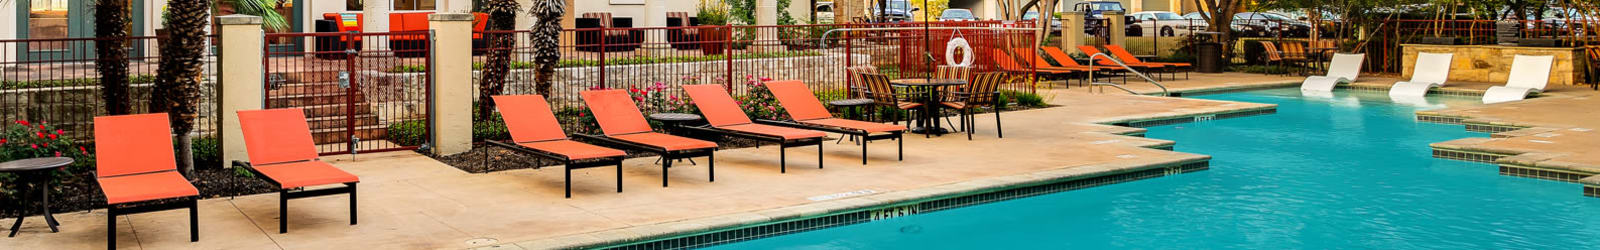 Schedule a tour at Sedona Ranch Apartments in San Antonio, Texas